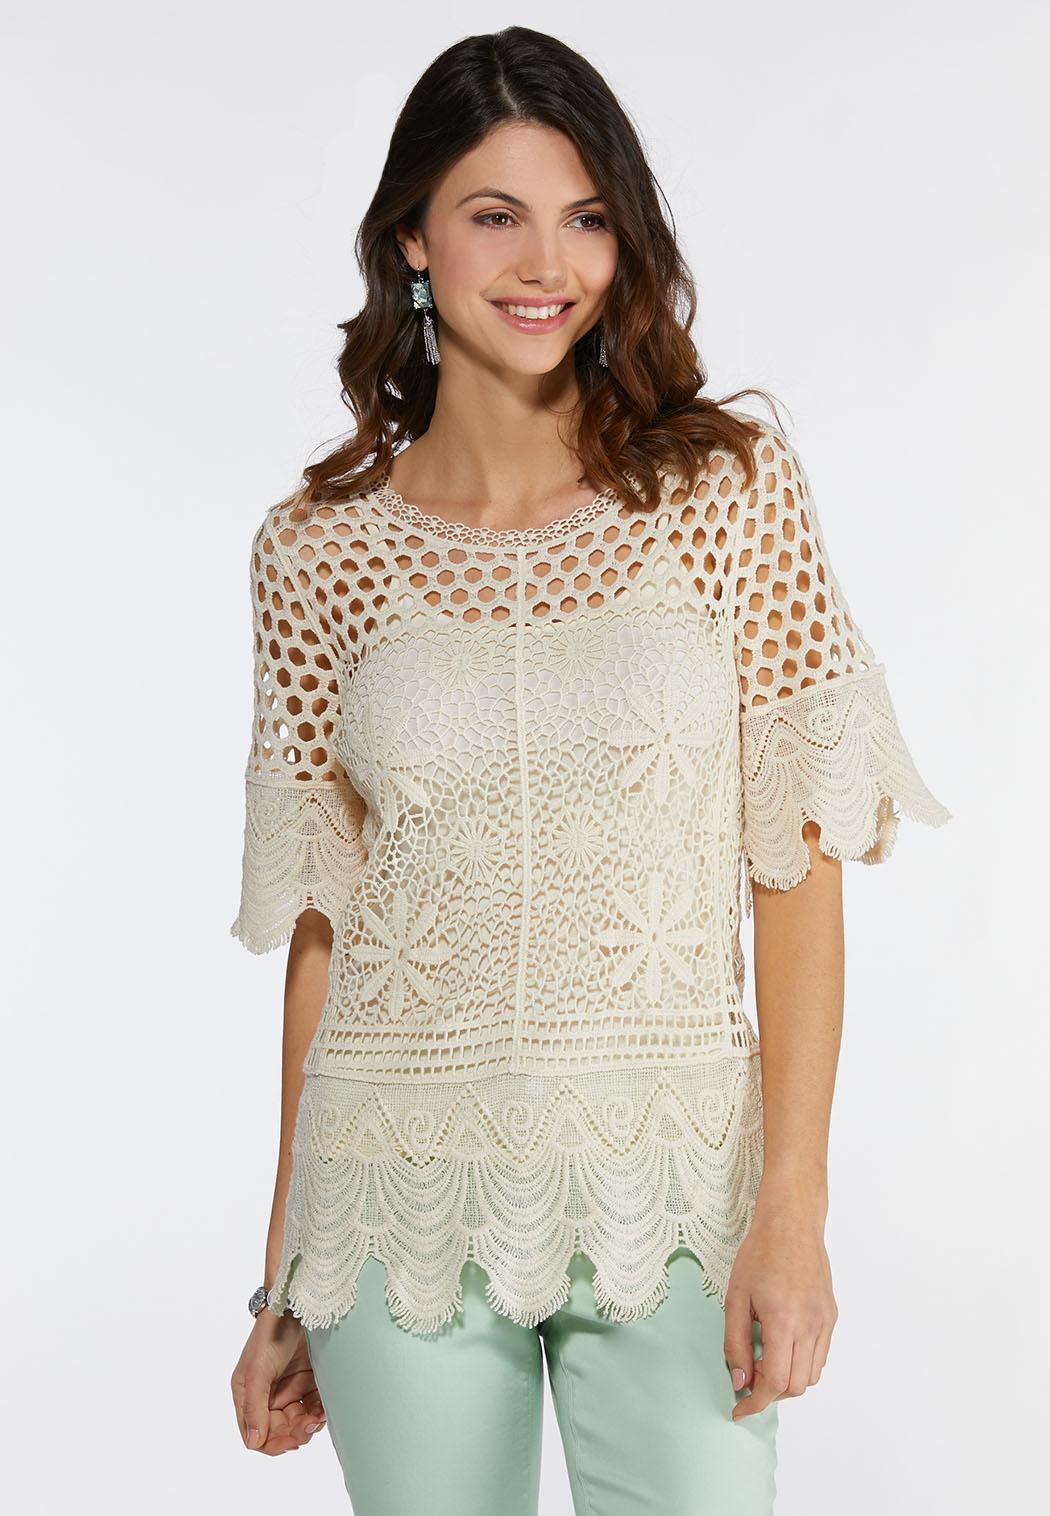 Crochet Scalloped Trim Top